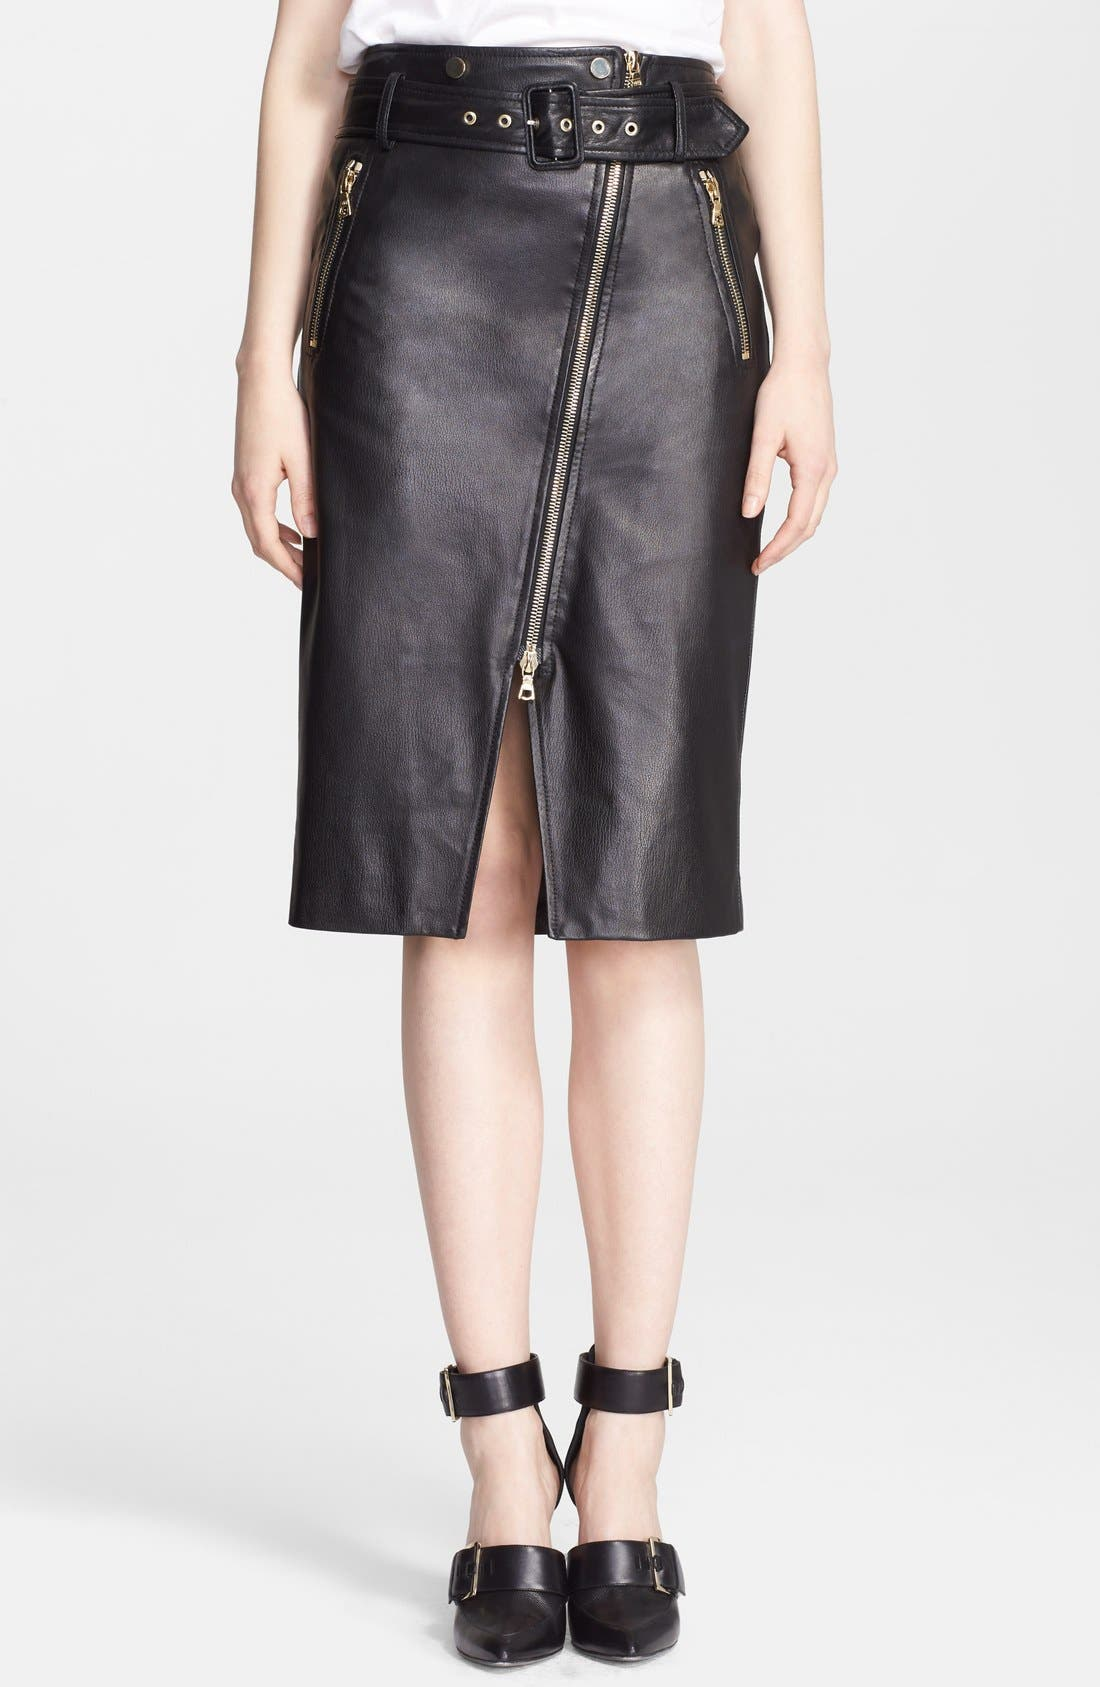 Alternate Image 1 Selected - Jason Wu Zip Detail Leather Skirt